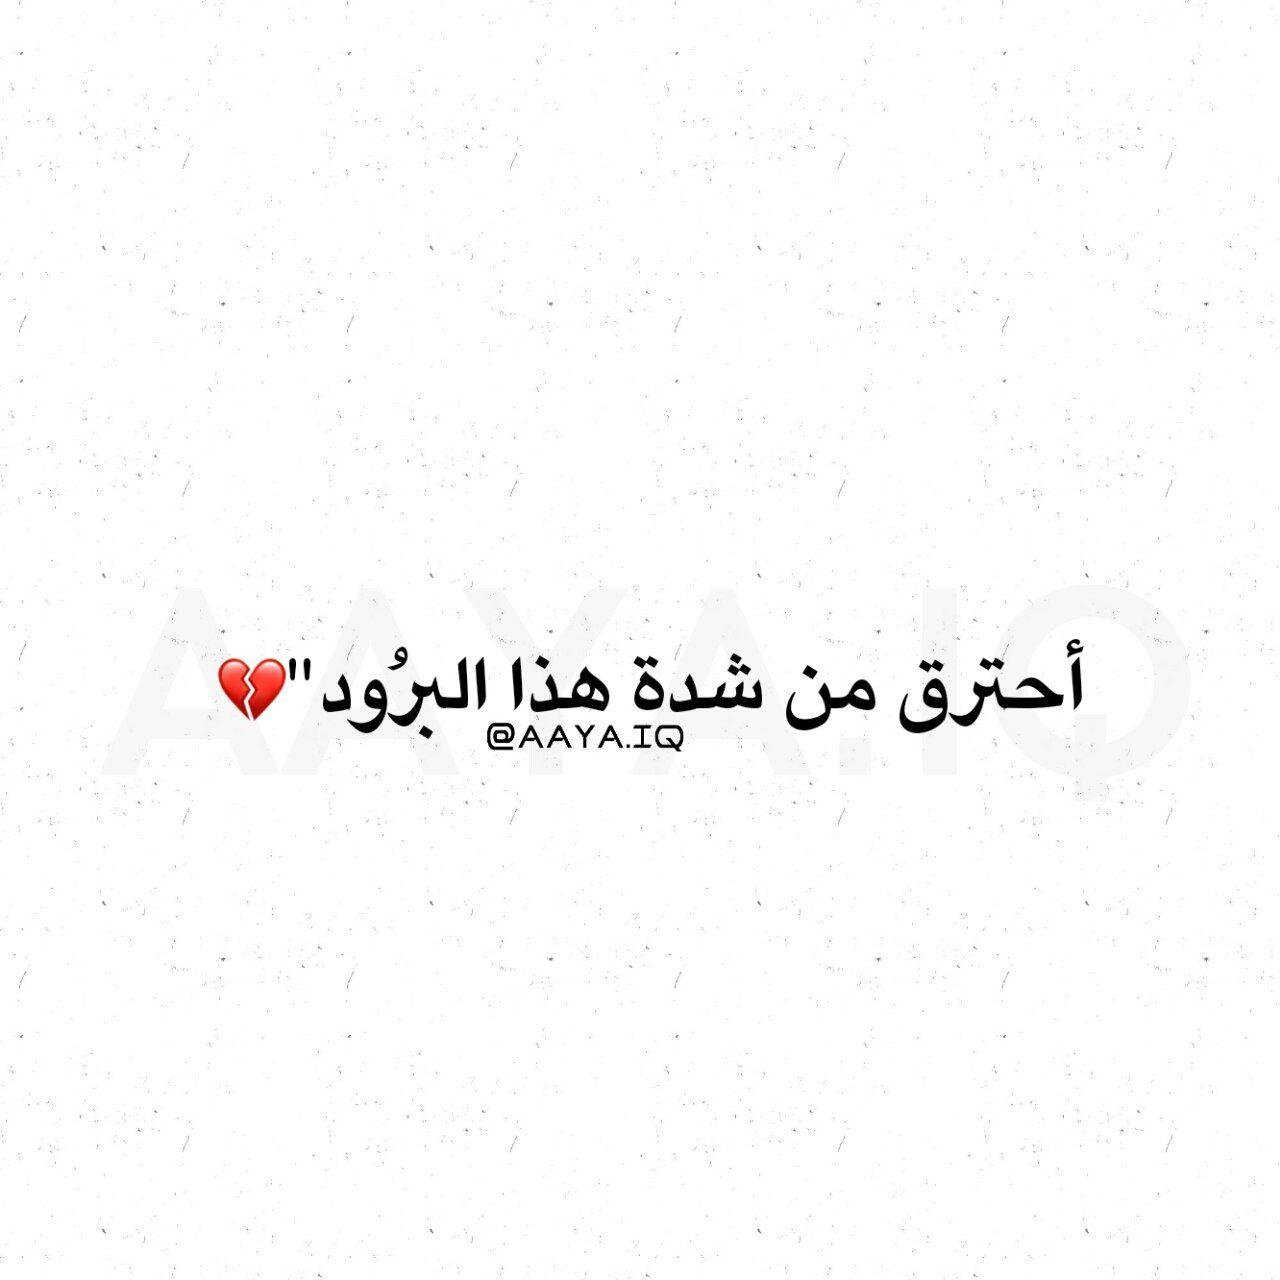 شدة البرود تقتلني Heart Quotes Arabic Quotes Words